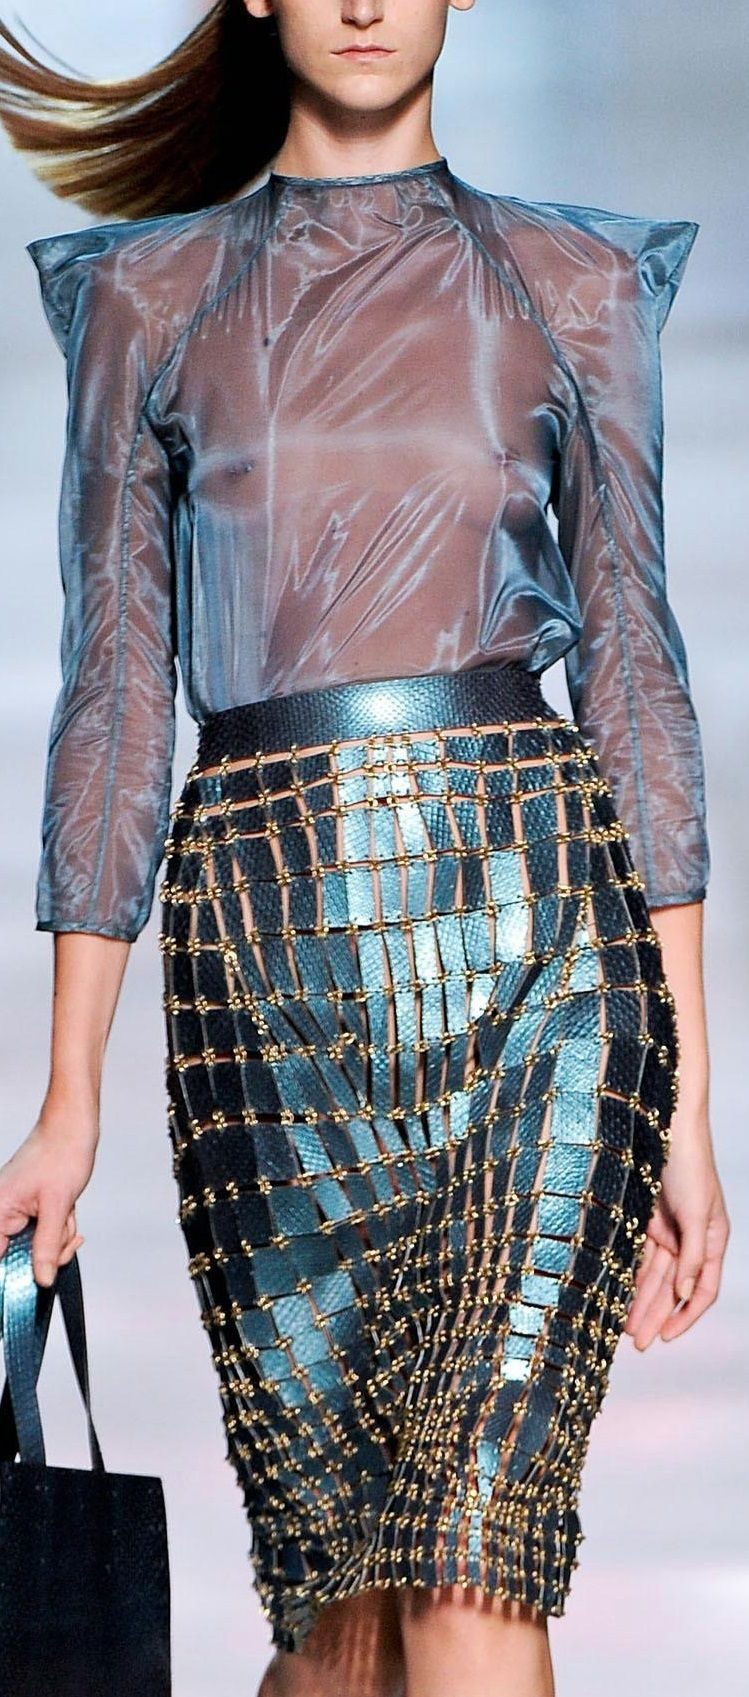 Paris Fashion Week Spring Summer 2012 Ready To Wear - Paco Rabanne - Catwalk-d143393cb9dc5c2d87389ec4ea9f6967